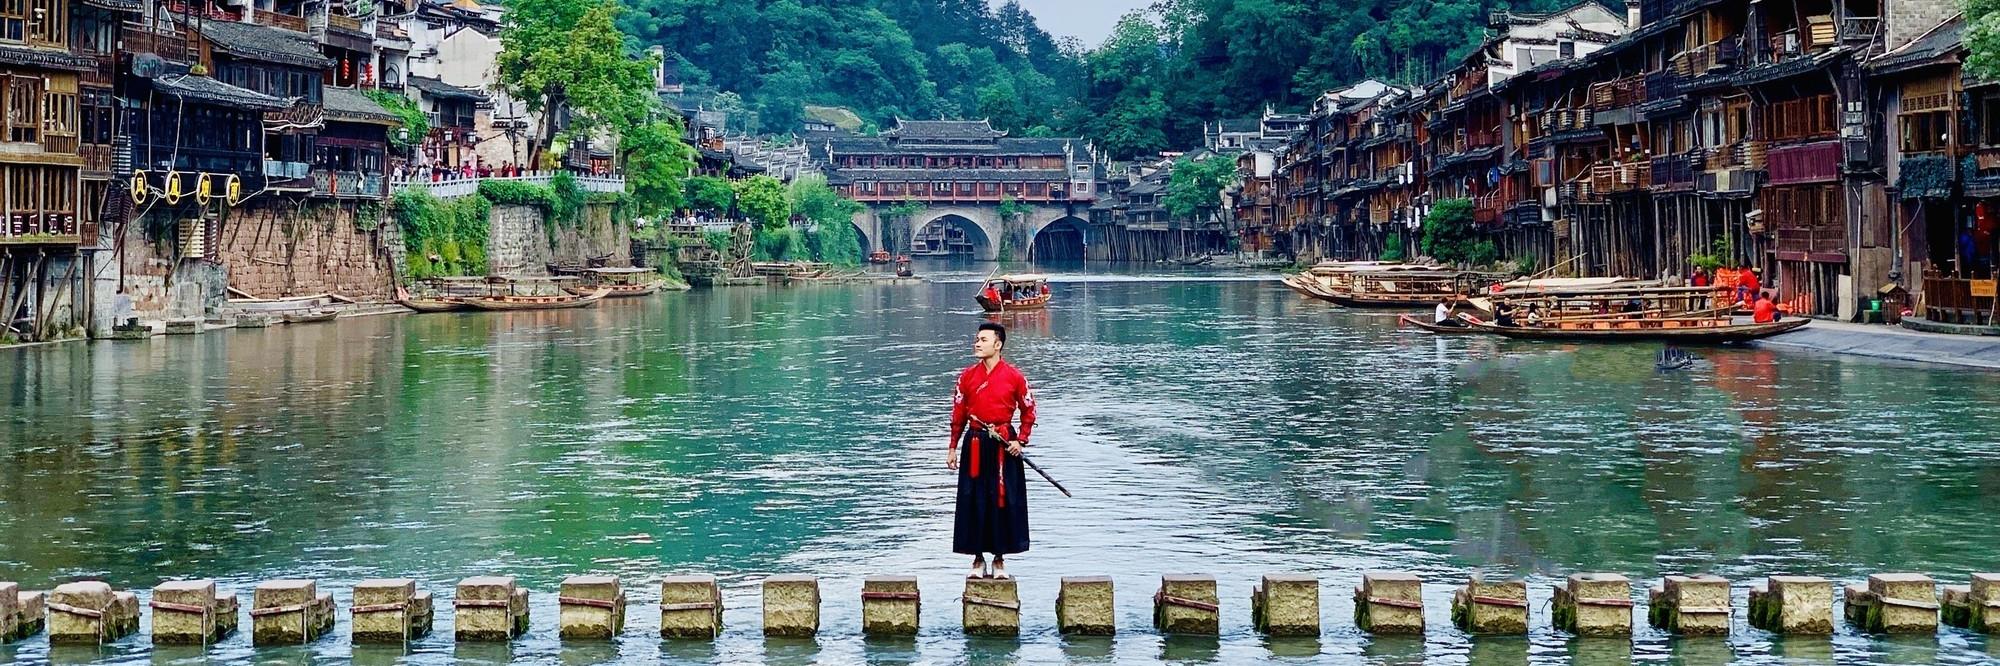 https://gody.vn/blog/duyle01014440/post/kinh-nghiem-can-co-khi-di-vi-vu-o-phuong-hoang-co-tran-4777